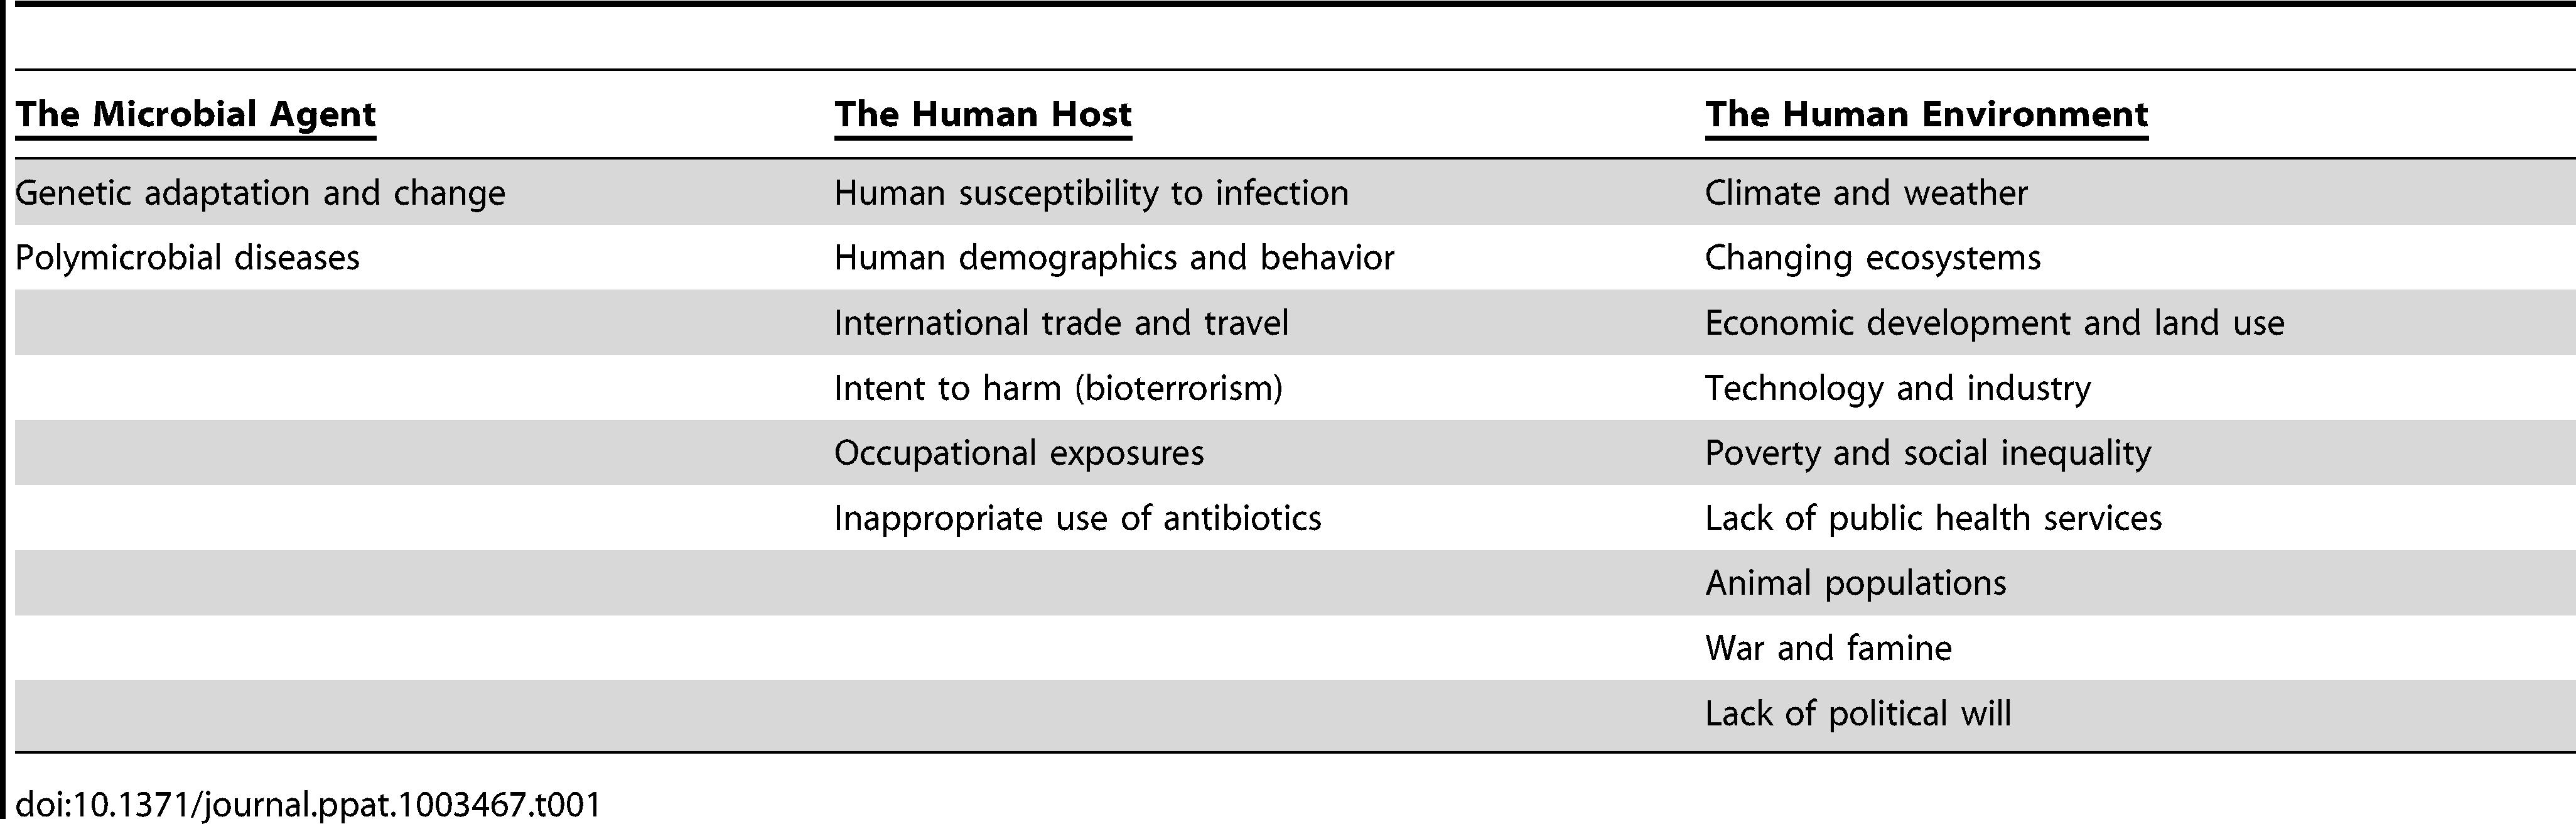 "Some major factors that underlie disease emergence and reemergence <em class=""ref"">[2]</em>, <em class=""ref"">[5]</em>."